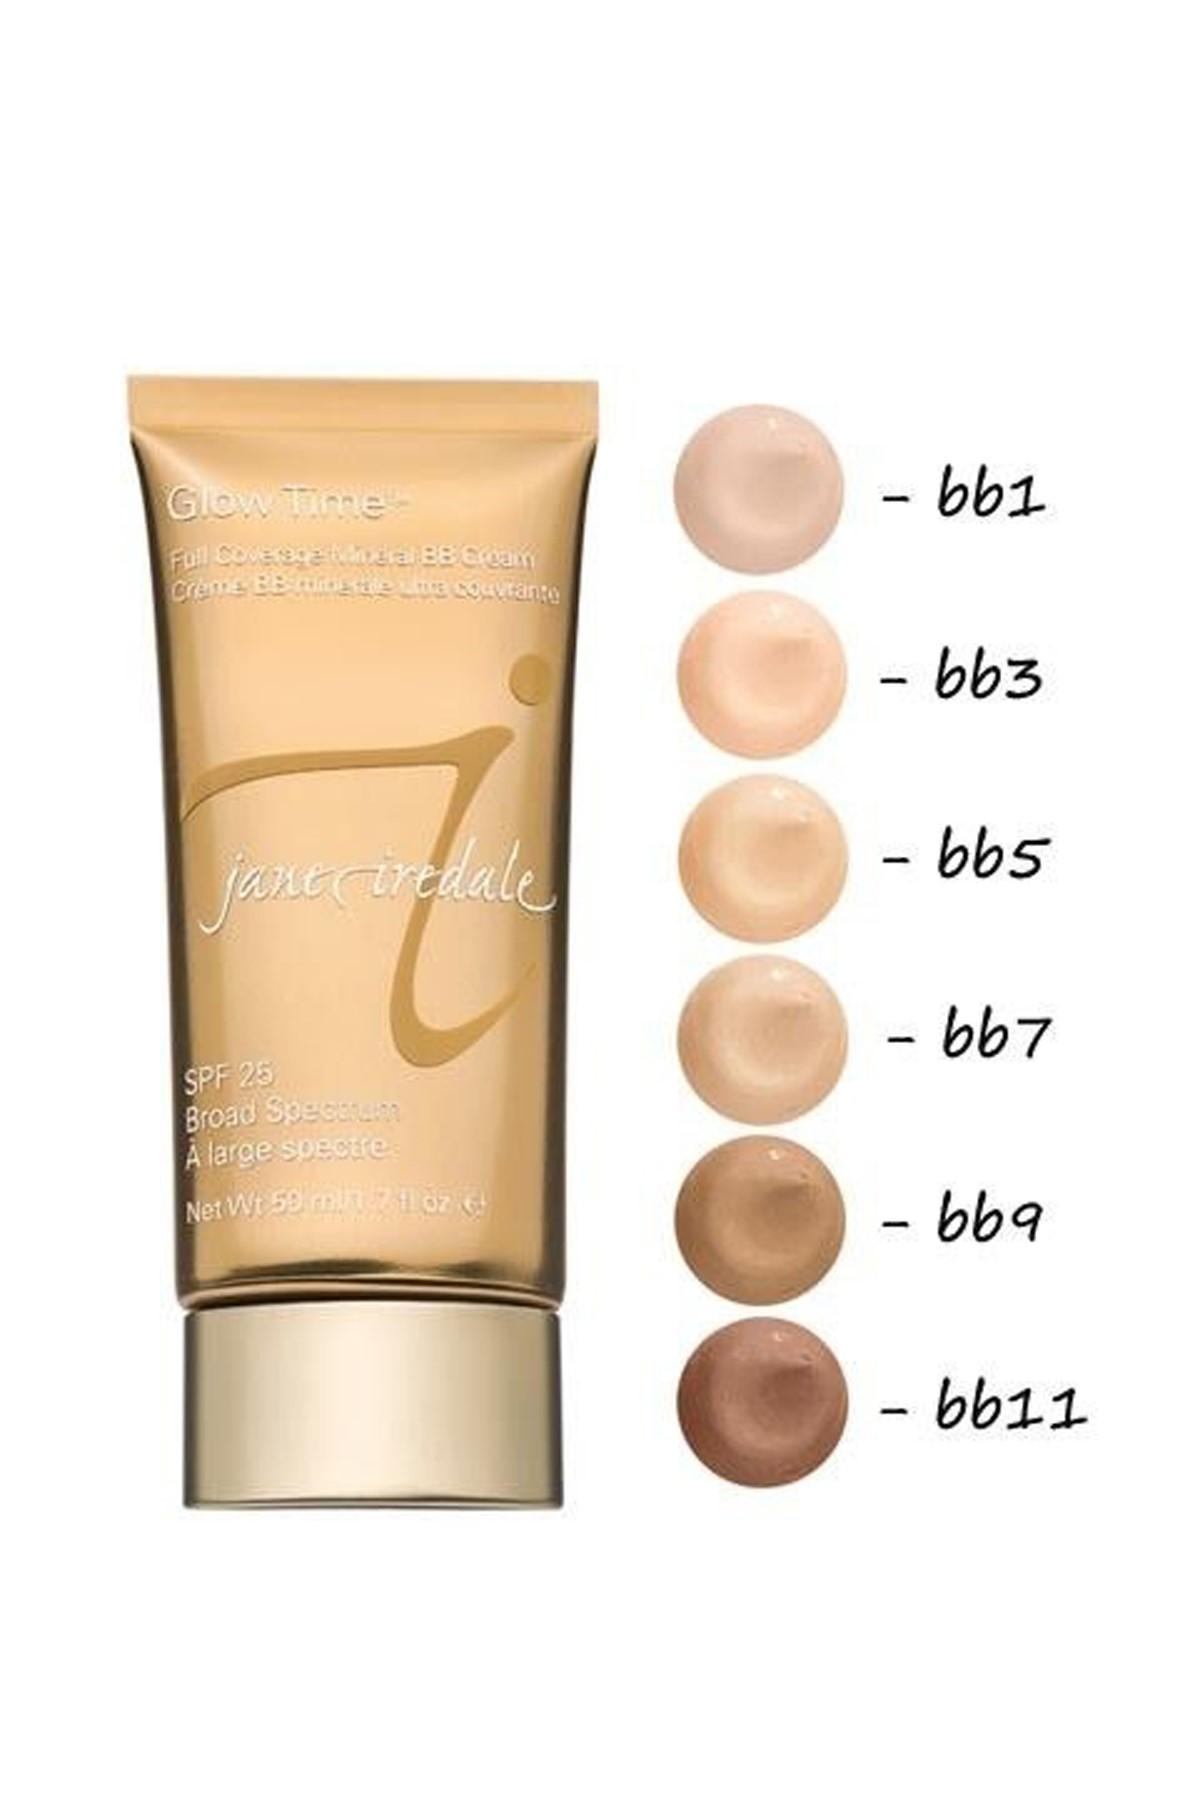 Jane Iredale BB Krem - Glow Time Full Coverage Mineral BB Cream BB7 50 ml 670959120380 2